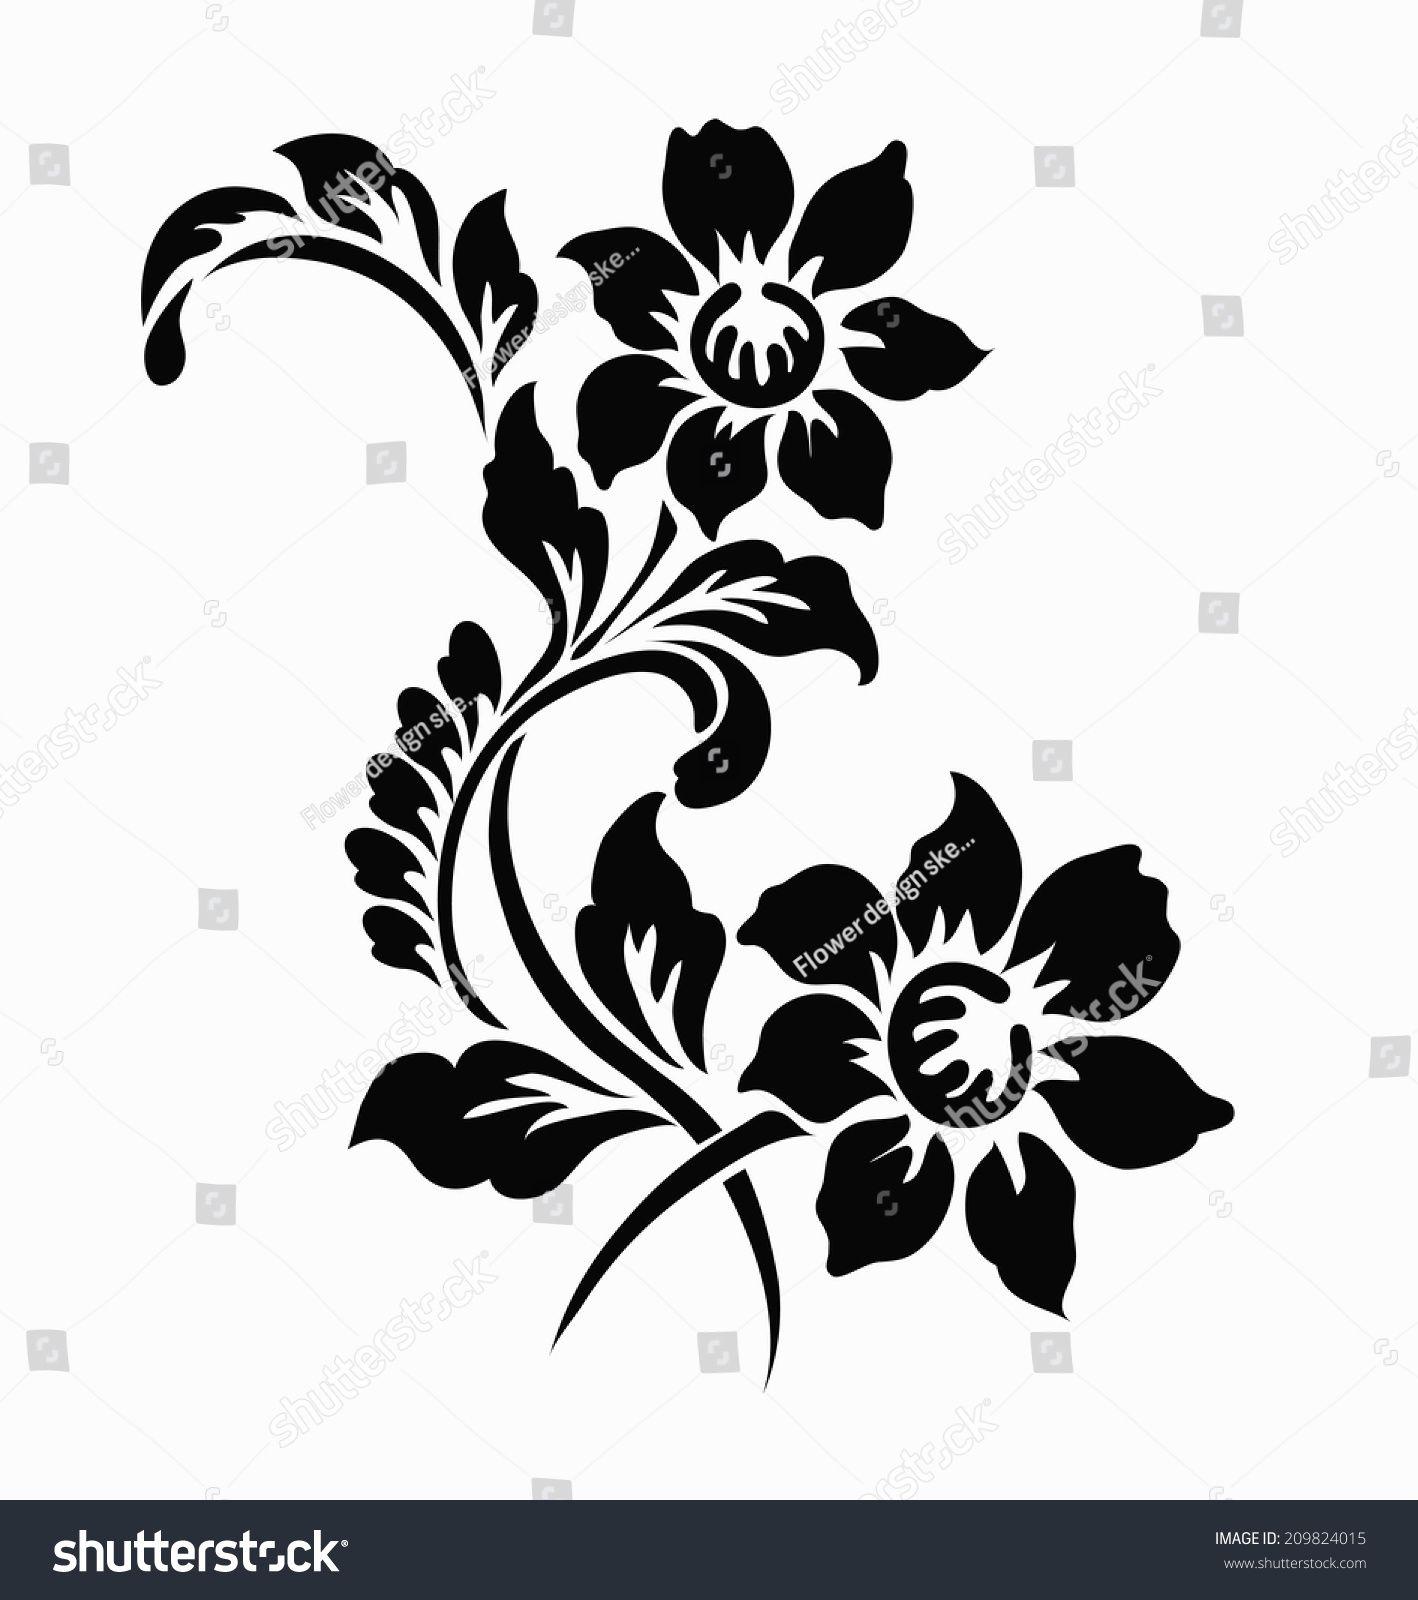 Pin By Neetu Gagan Gauba On Mehndi: Flower Motif For Design